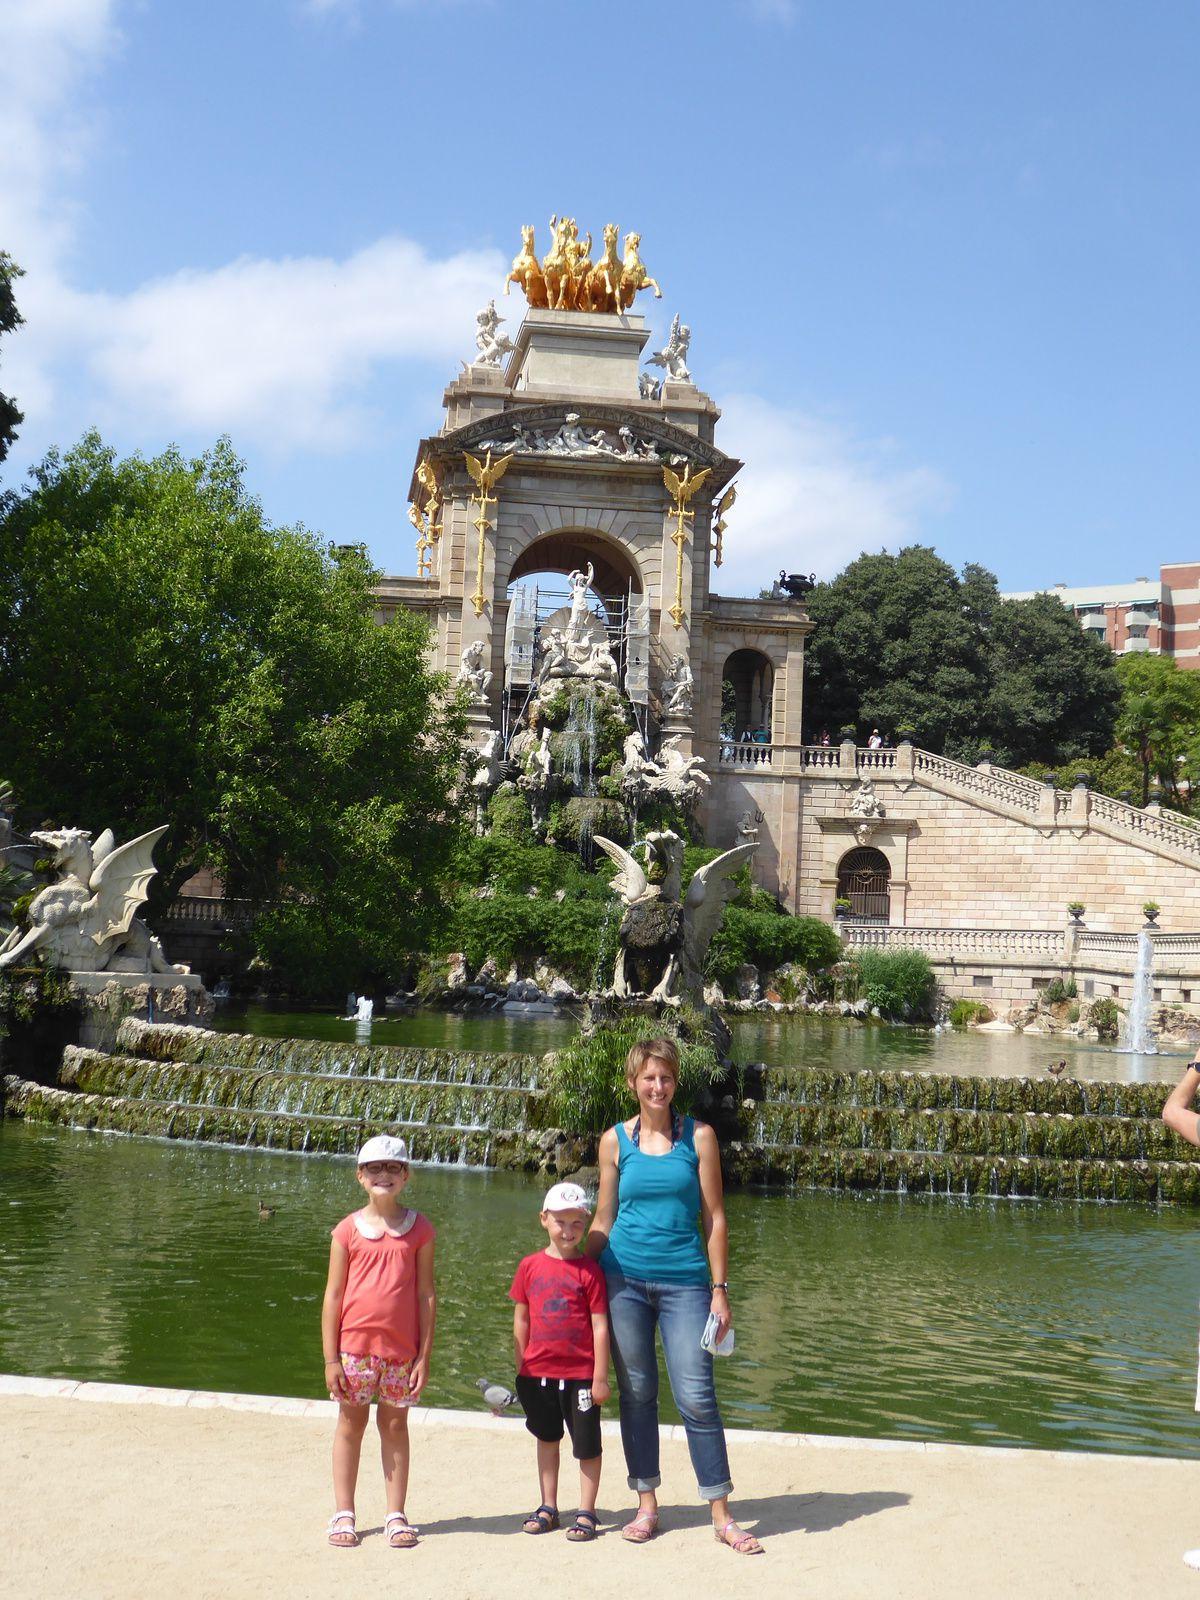 Espagne 2019 #33 Parc de La Ciutadella